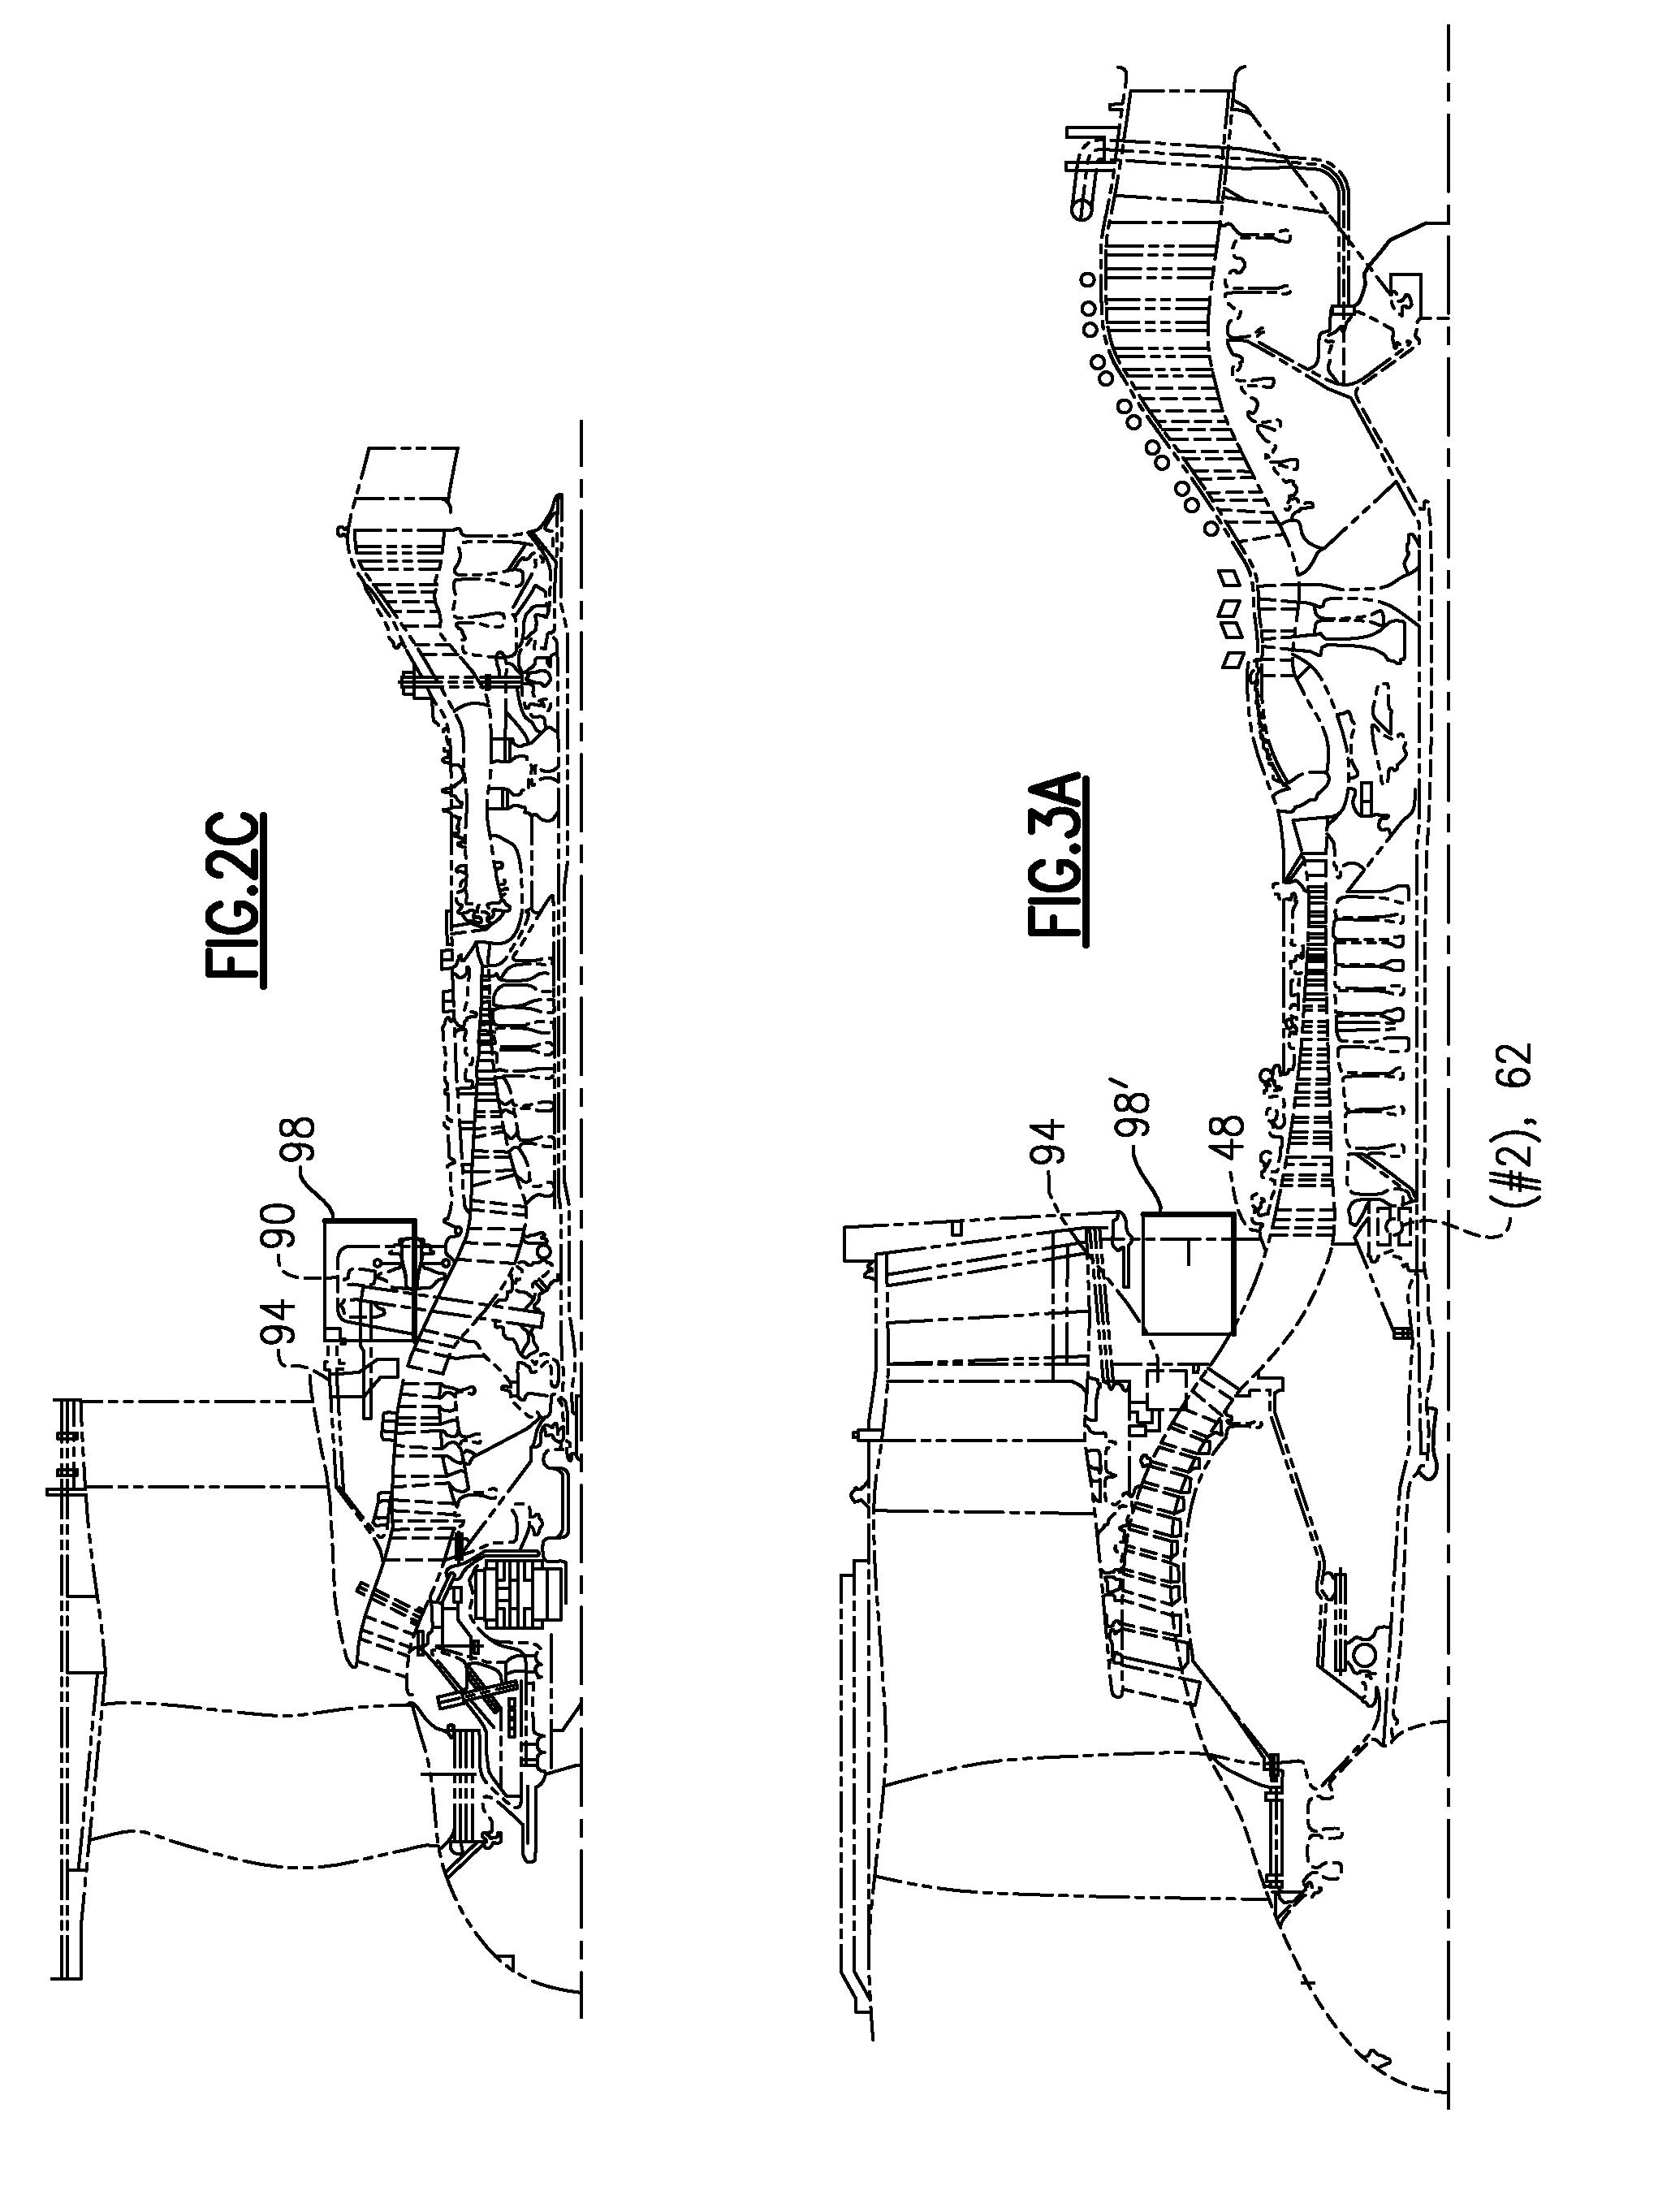 Patent US Integrated actuator module for gas turbine